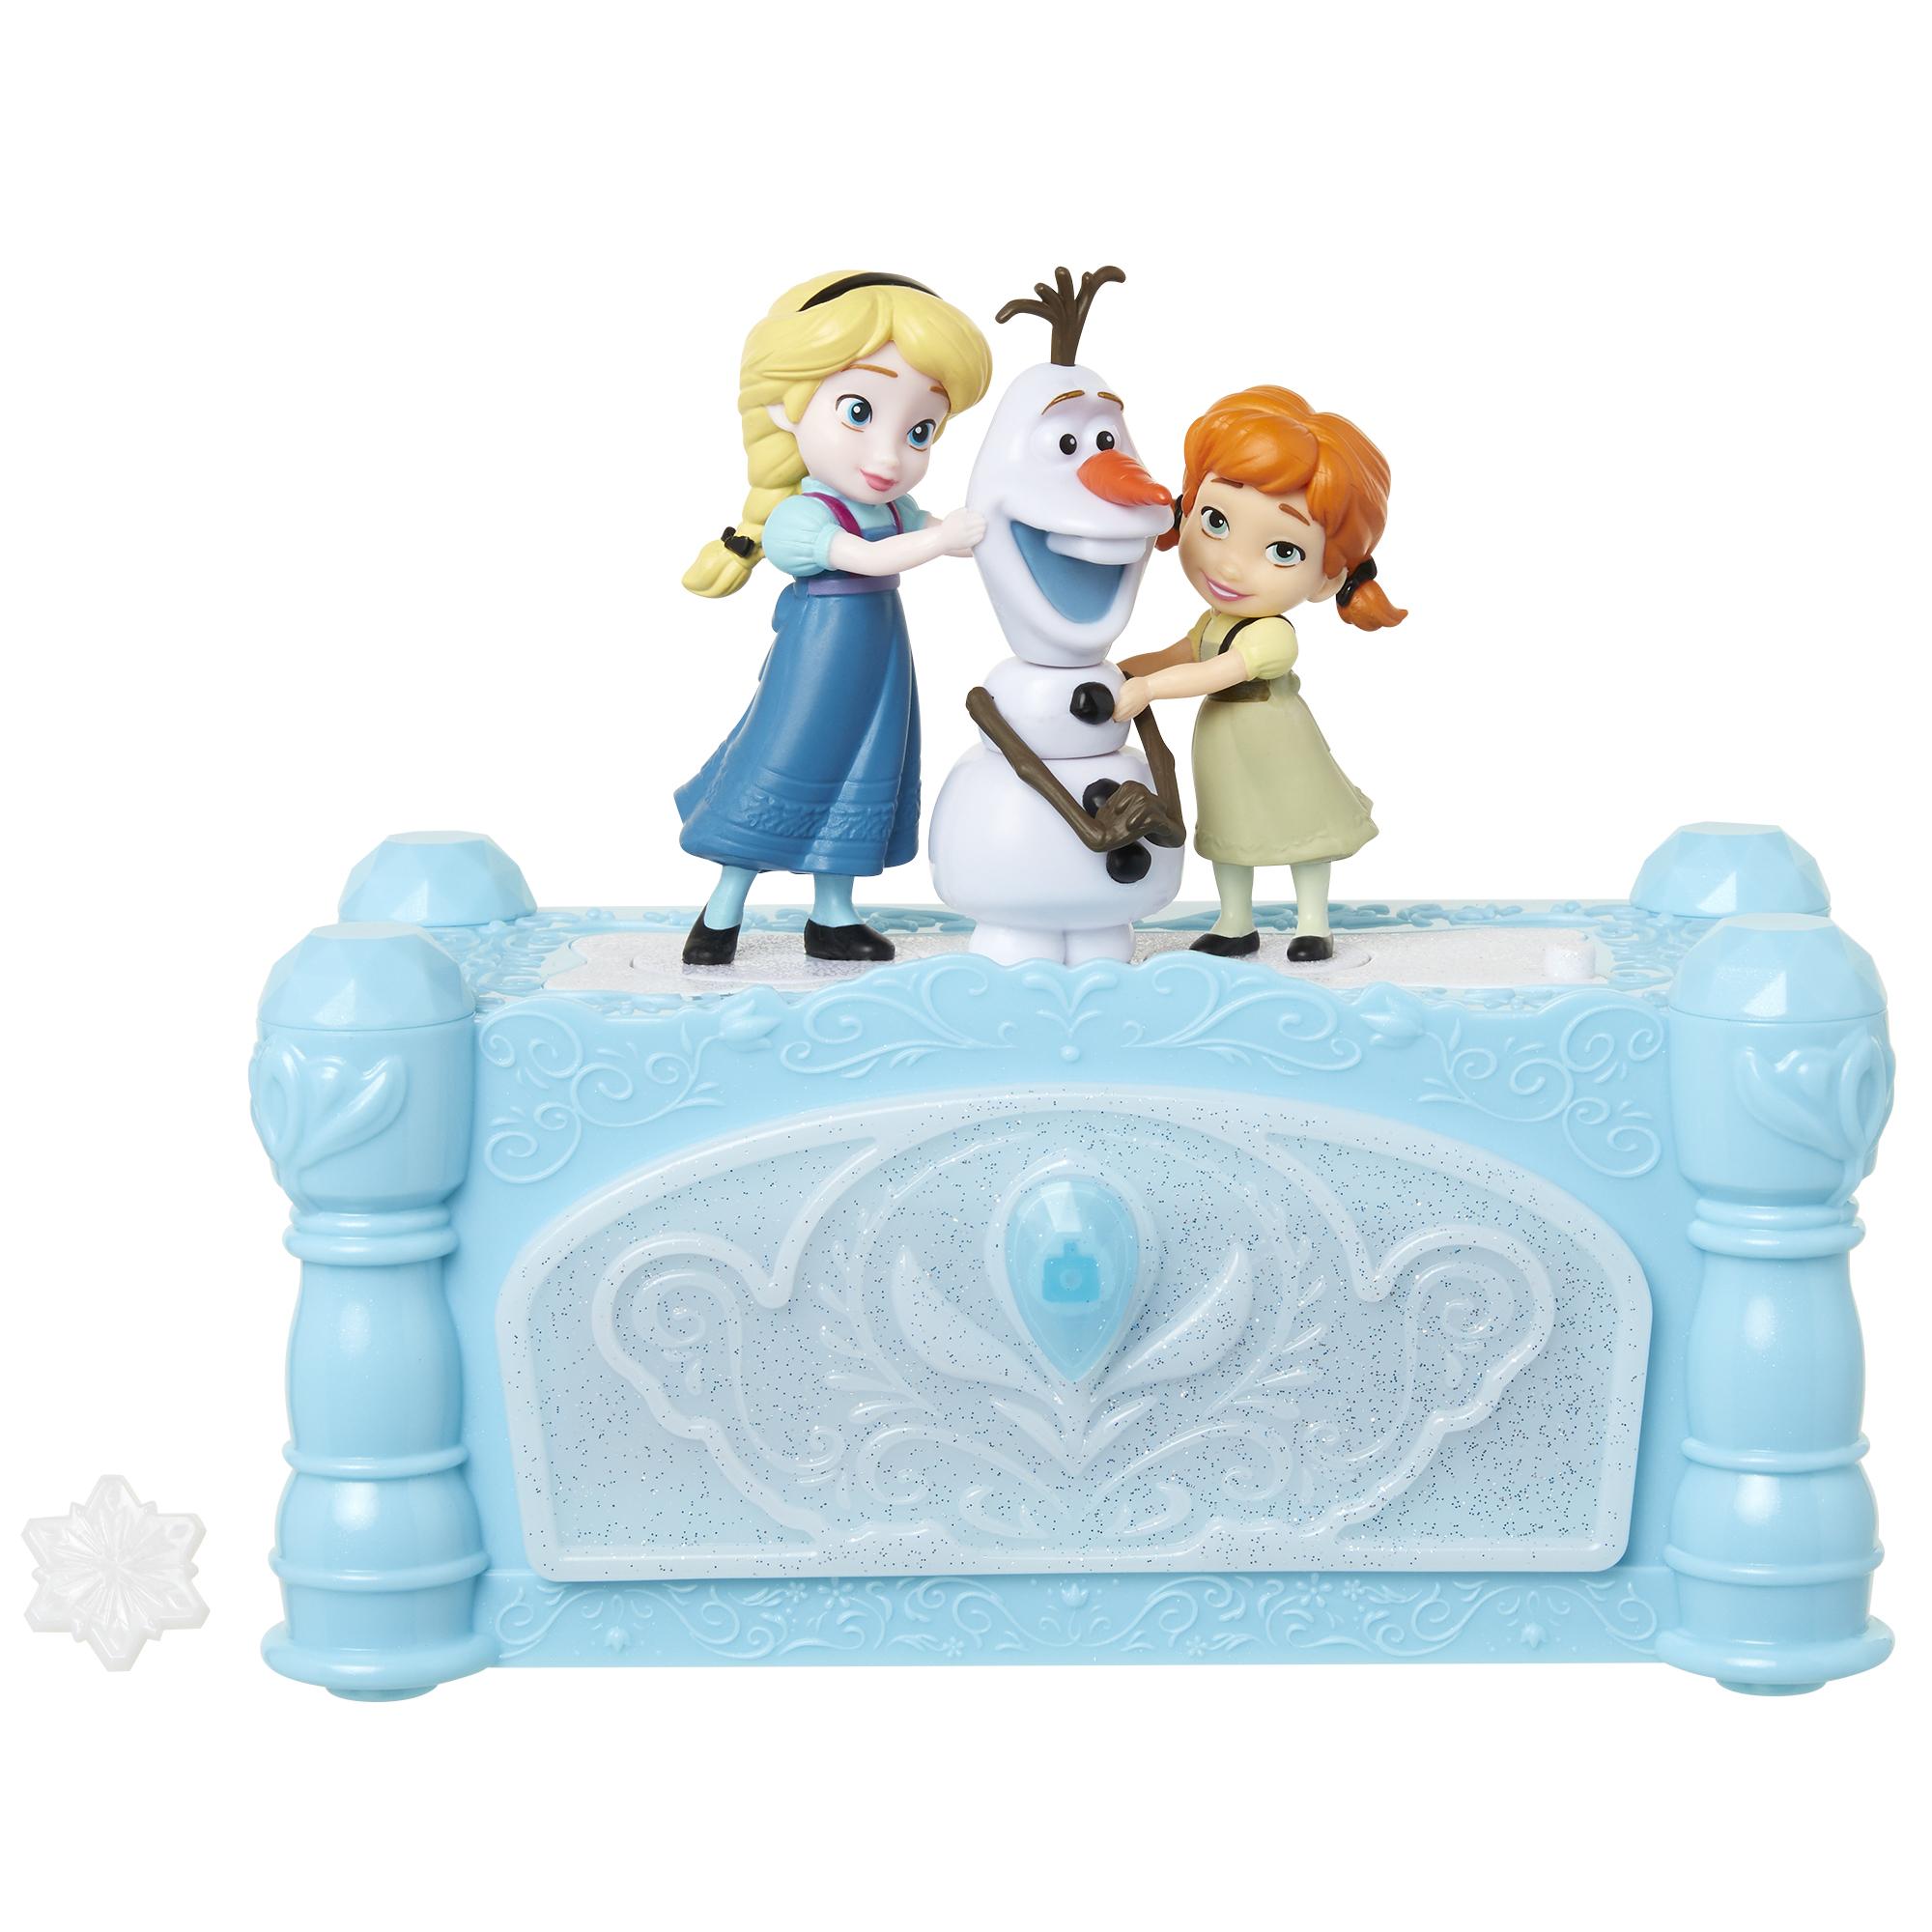 Disney Frozen Do You Want to Build A Snowman 2.0 Jewelry Box $11 + Free Shipping w/ $35+